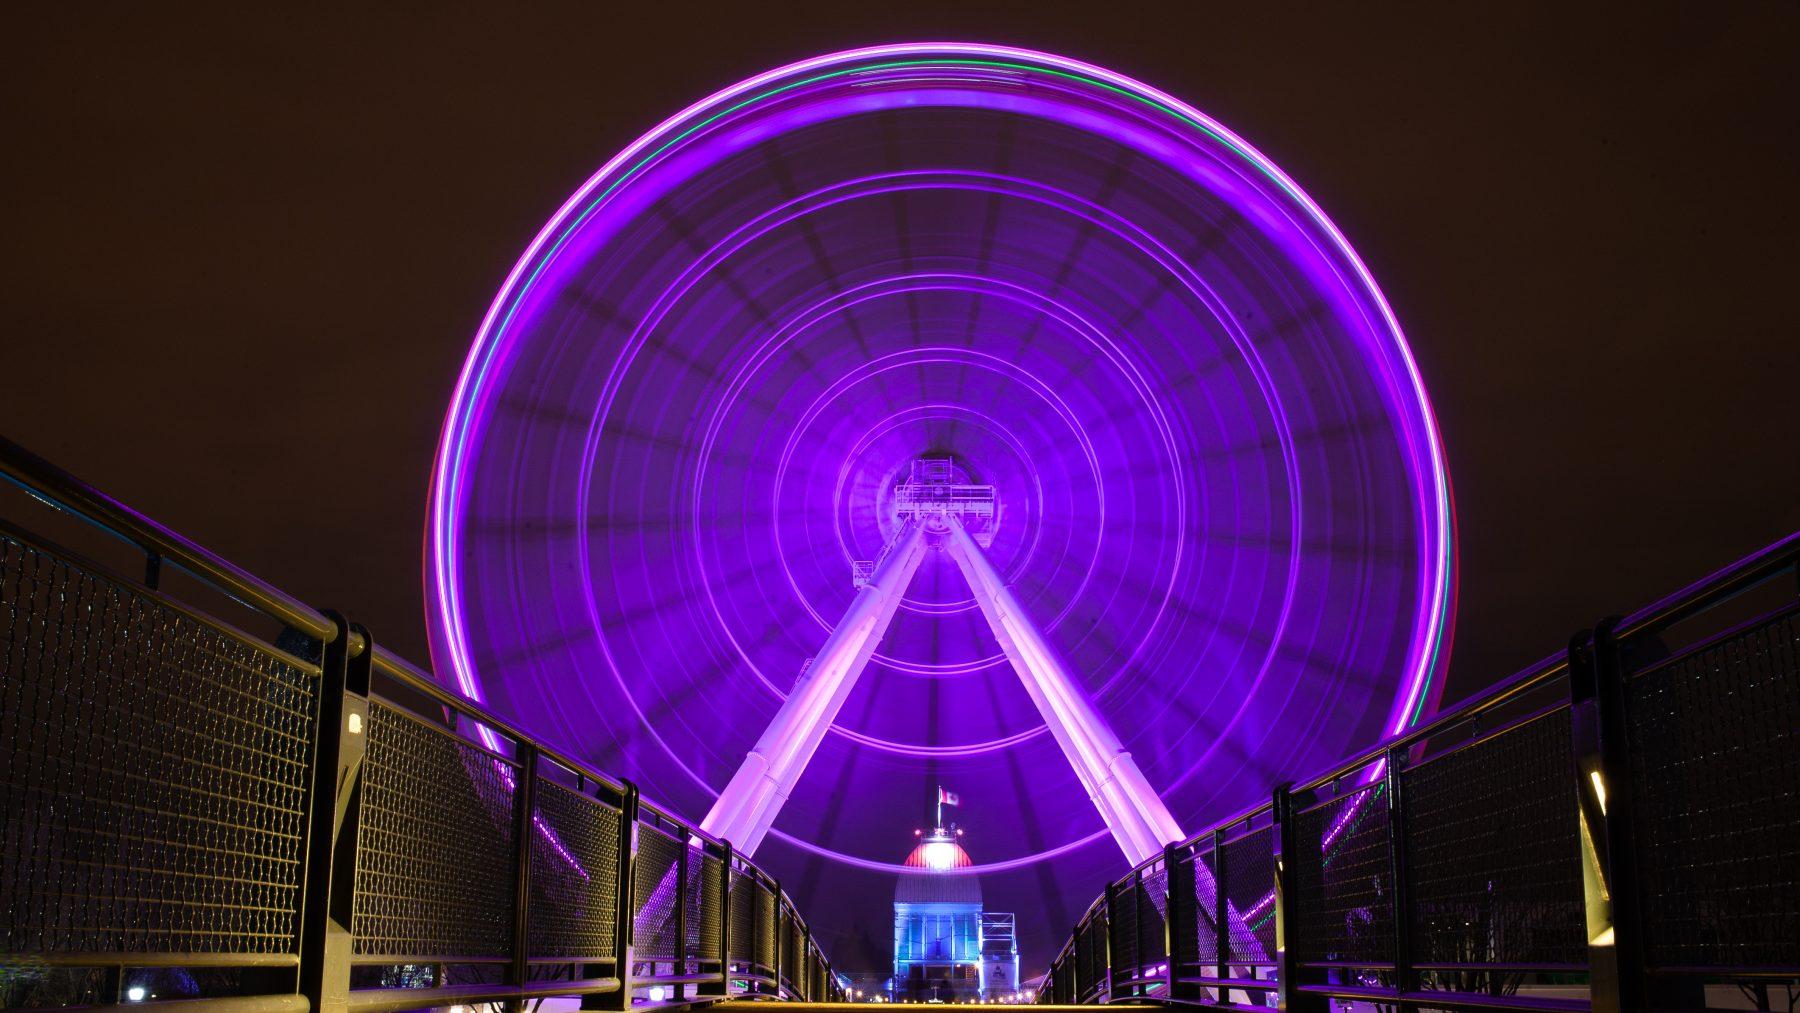 Motion blur shot of a ferris wheel lit up with purple lights